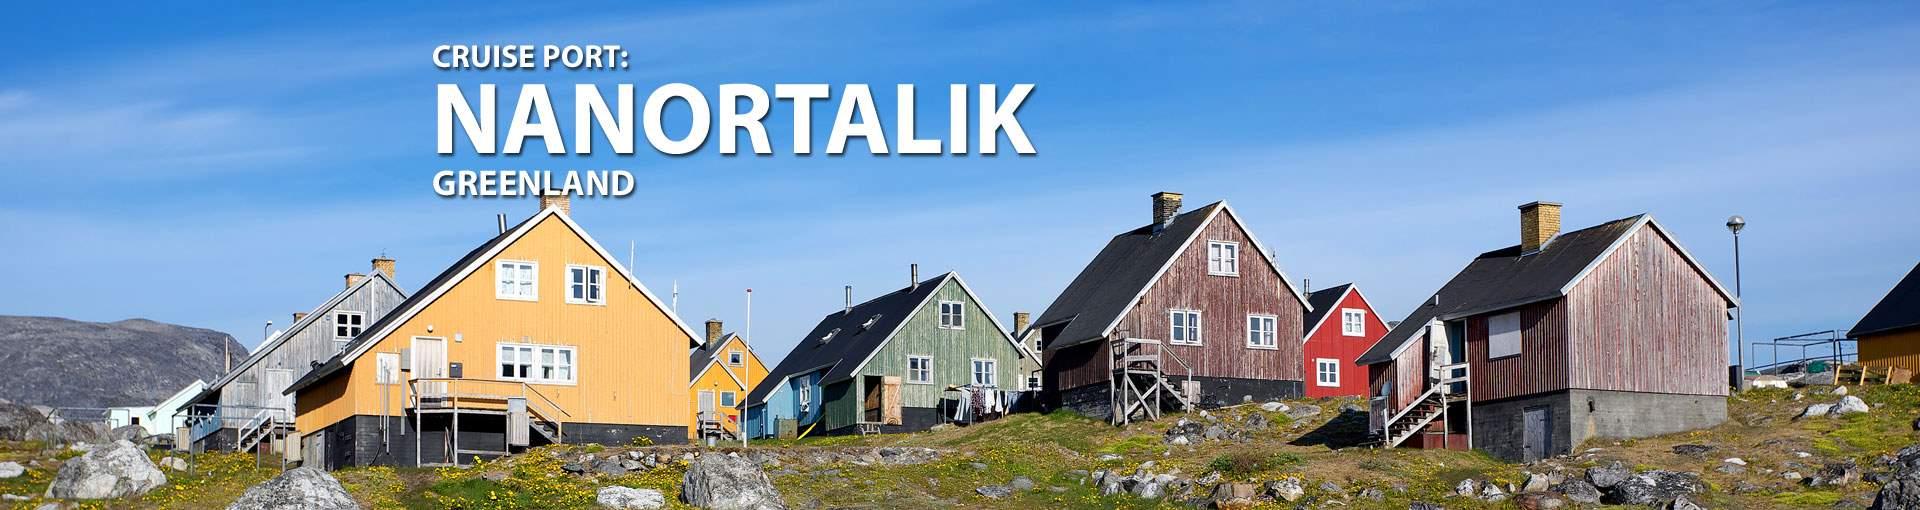 Cruises to Nanortalik, Greenland